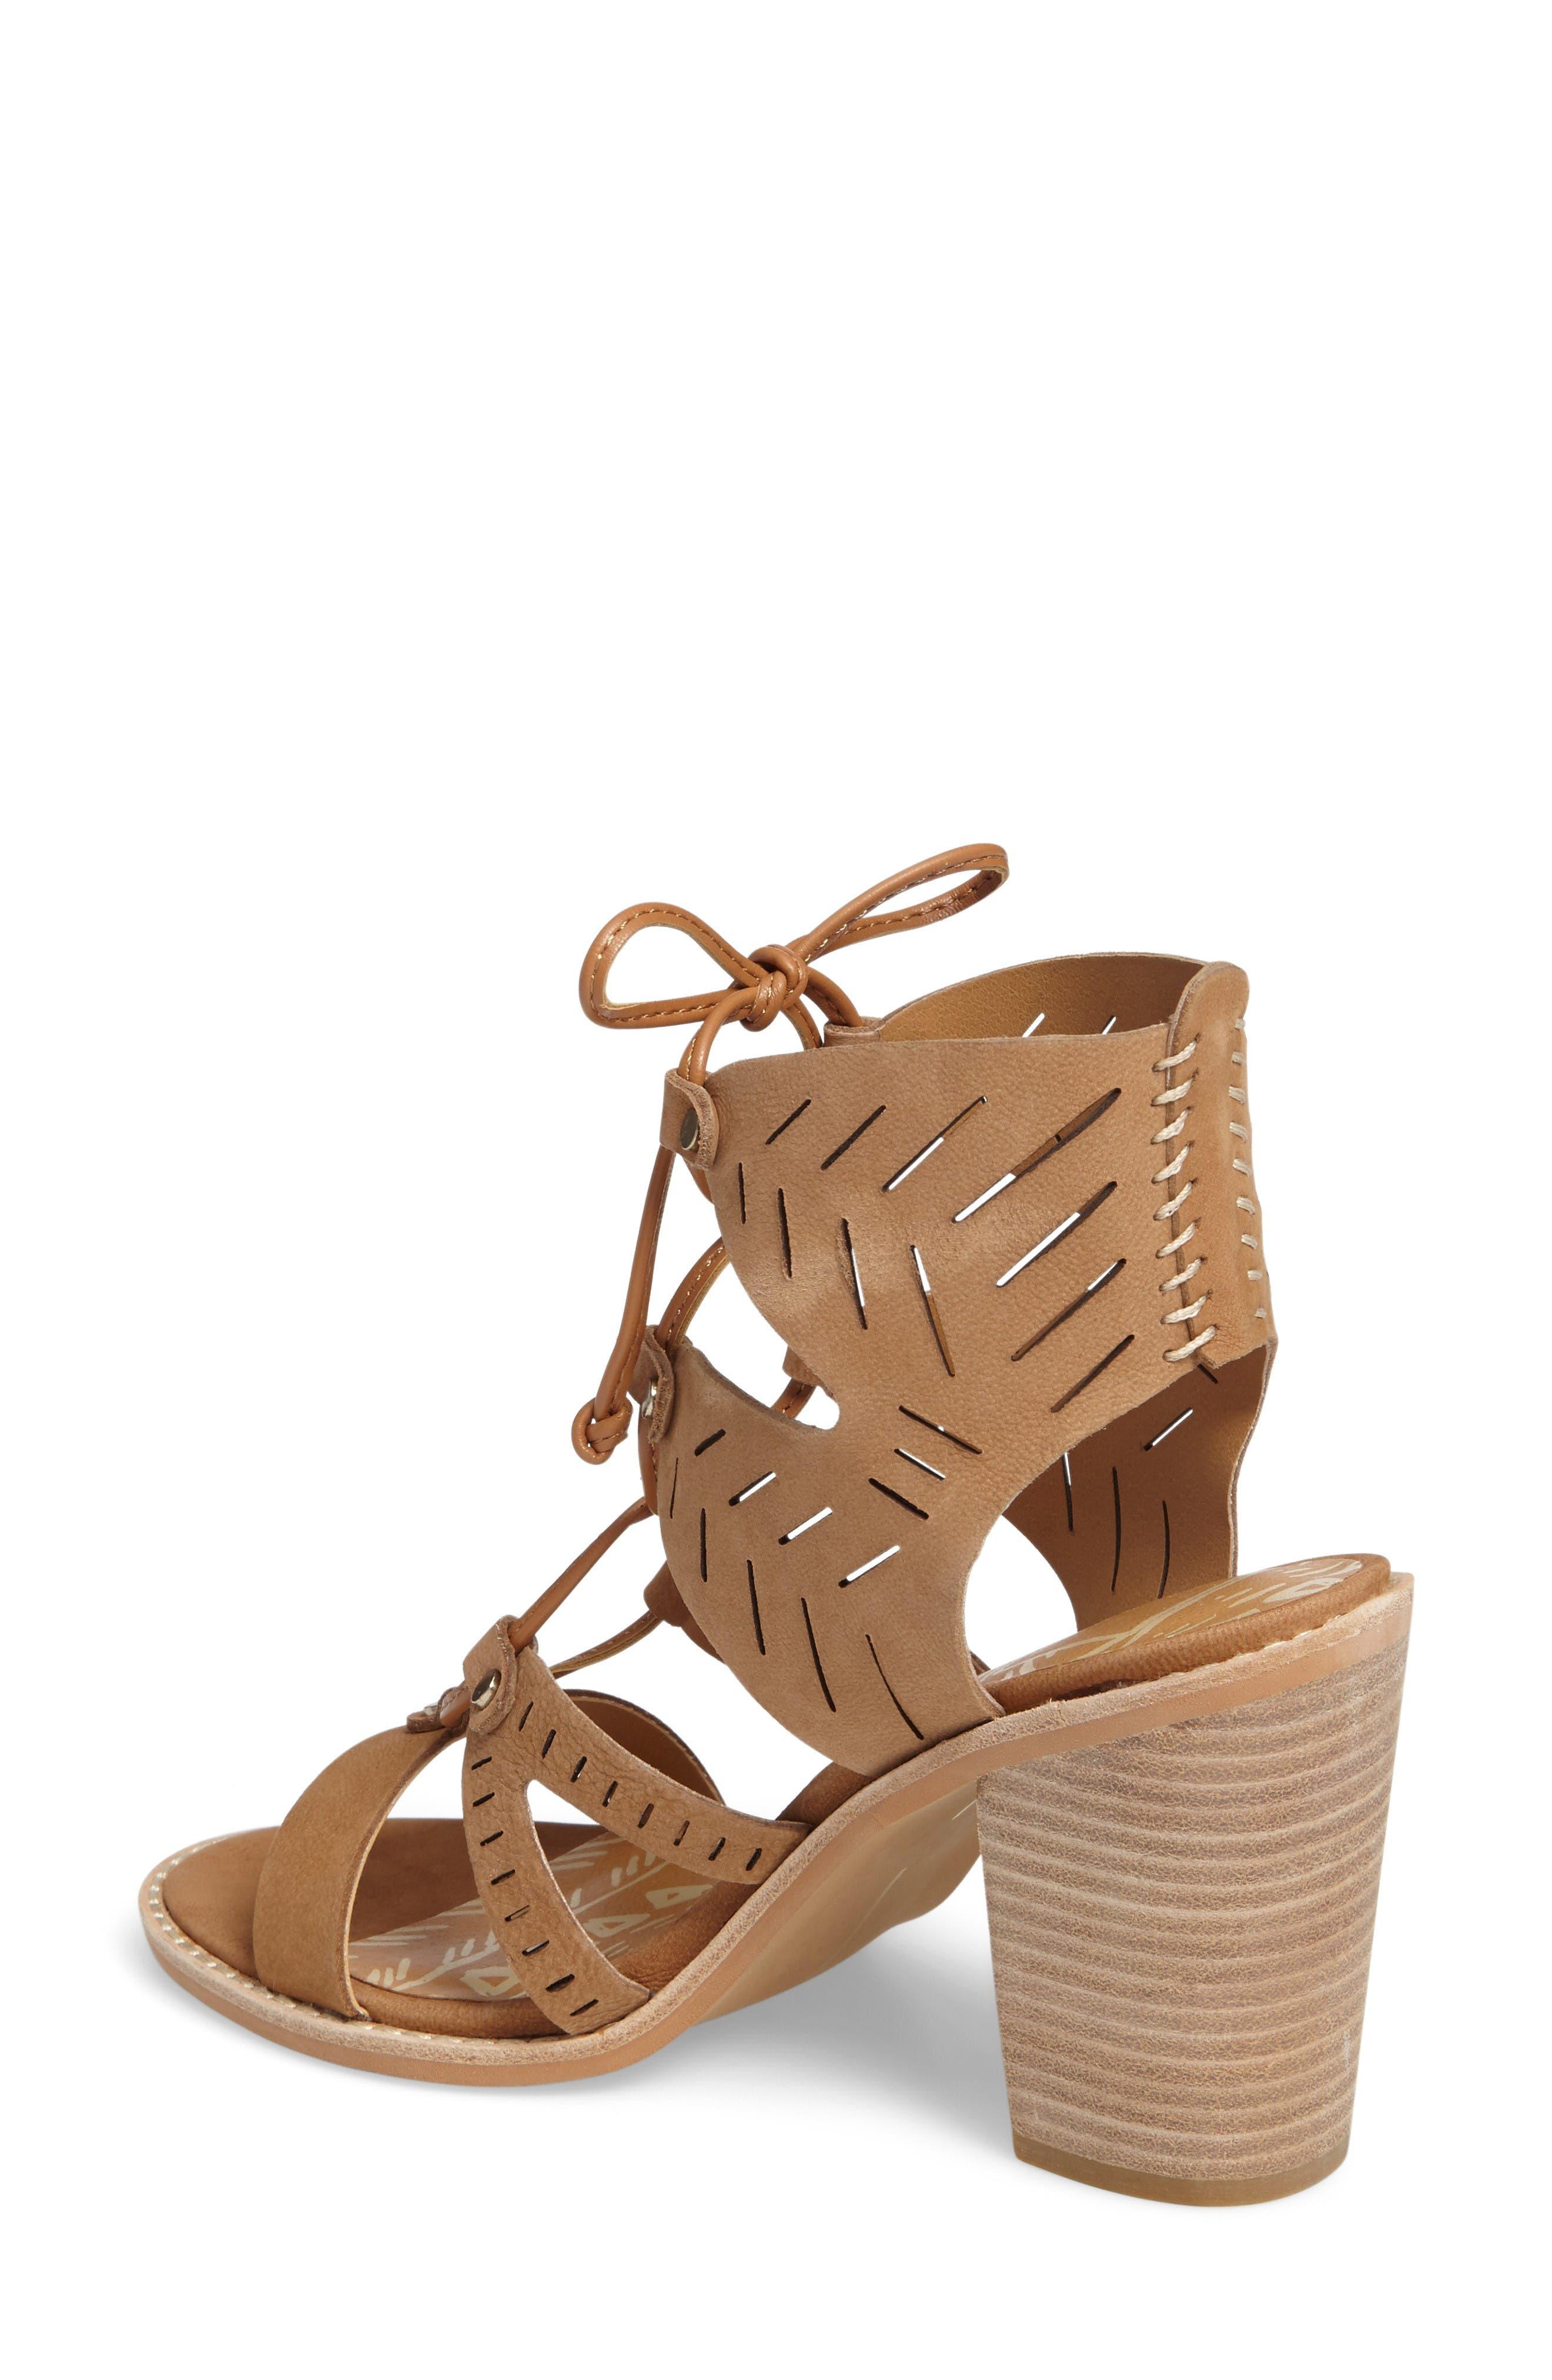 Luci Ghillie Lace Sandal,                             Alternate thumbnail 2, color,                             Saddle Nubuck Leather